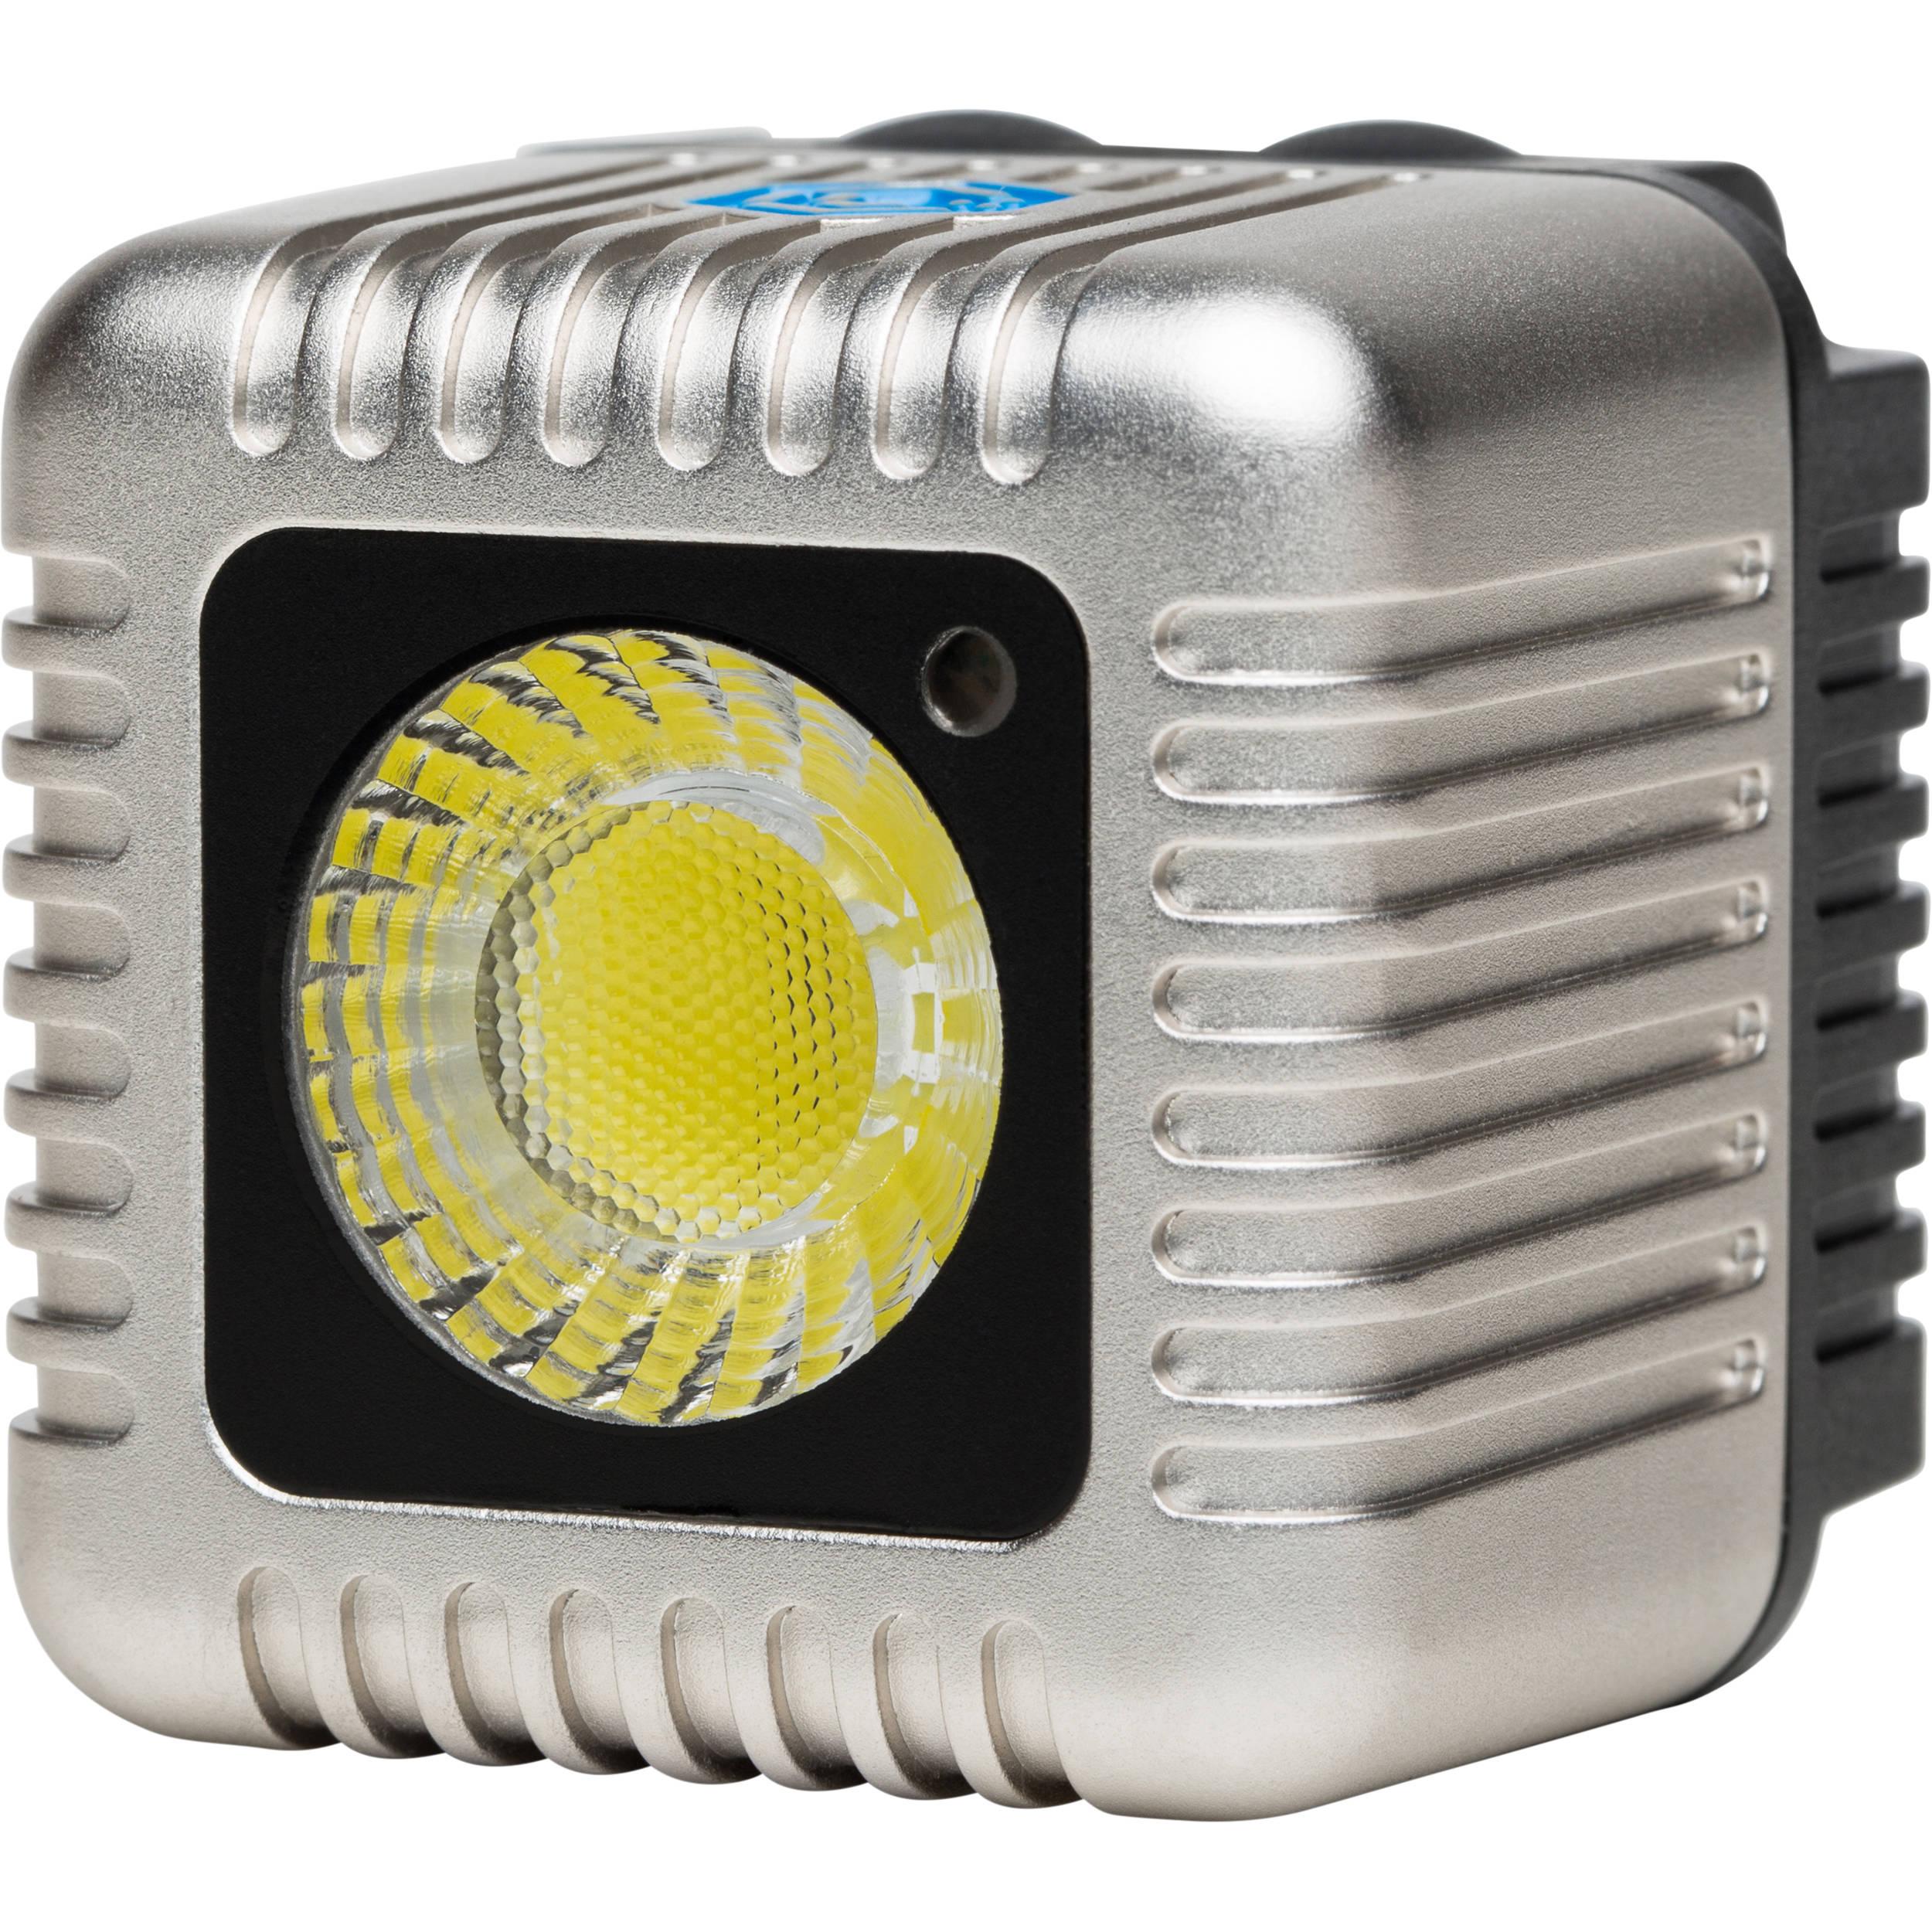 lume cube 1500 lumen light silver lc 11s b h photo video. Black Bedroom Furniture Sets. Home Design Ideas